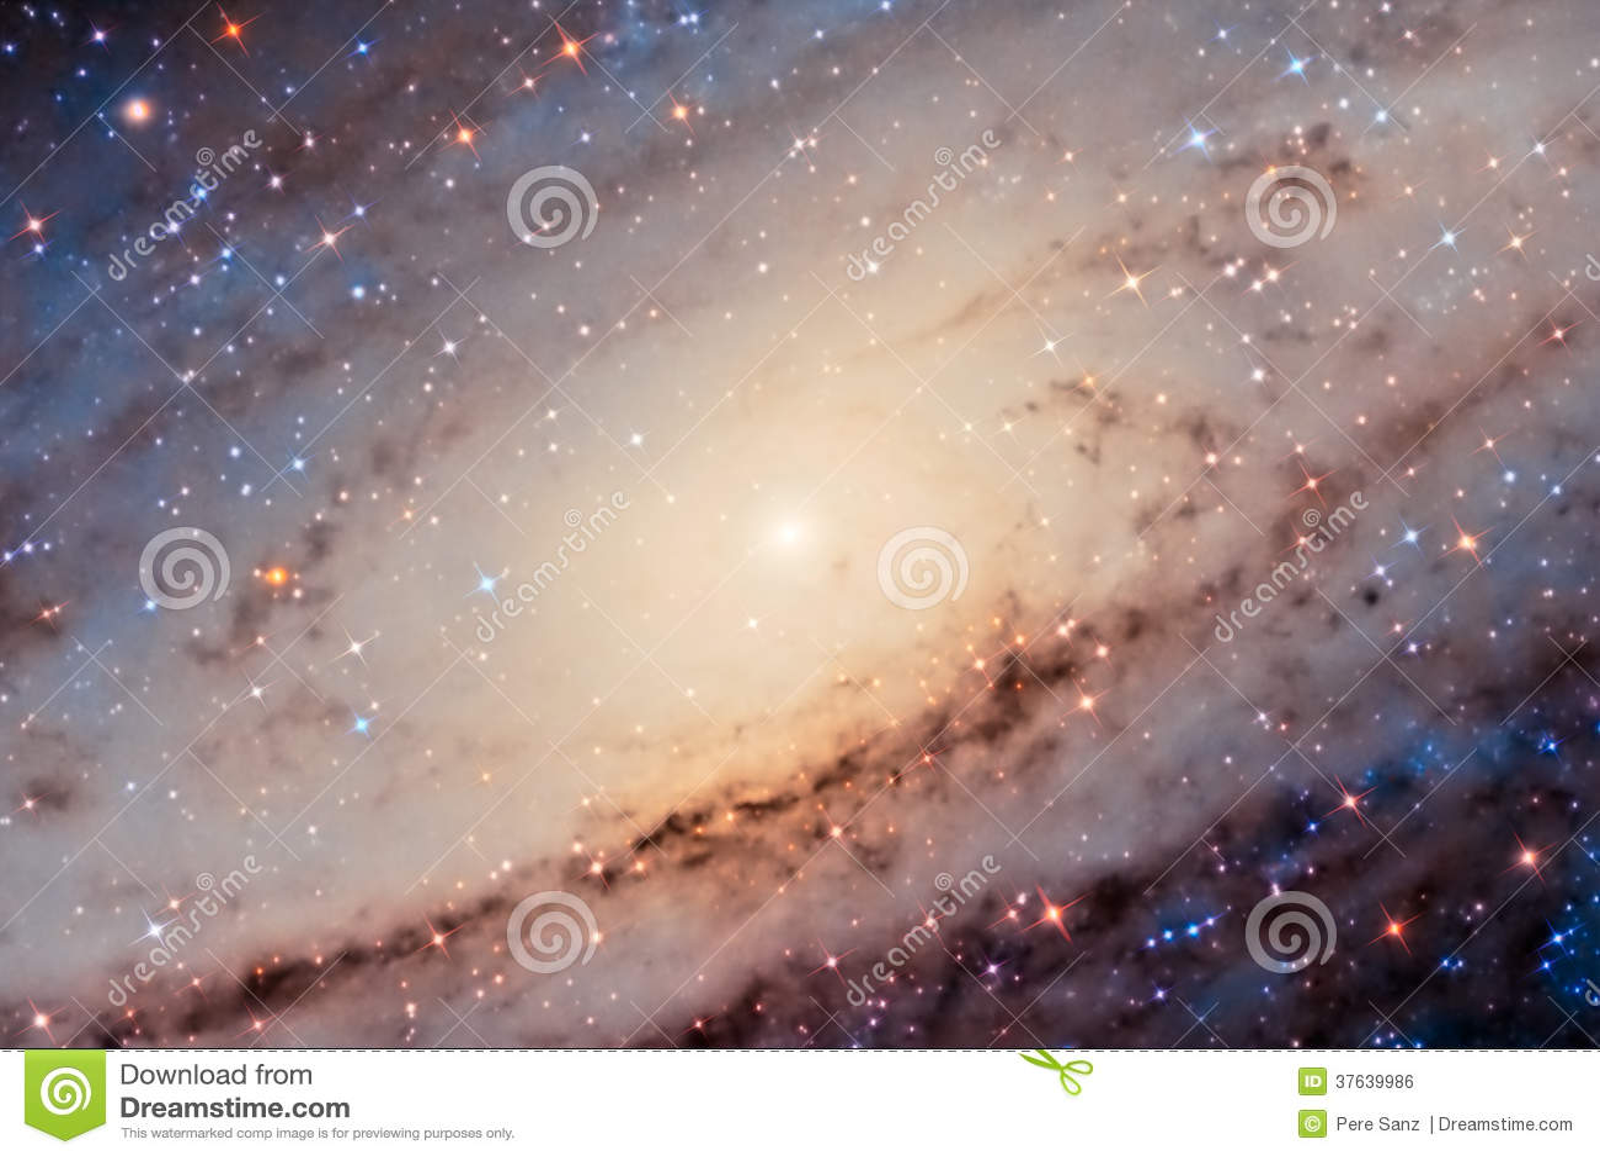 Andromeda Galaxy Center